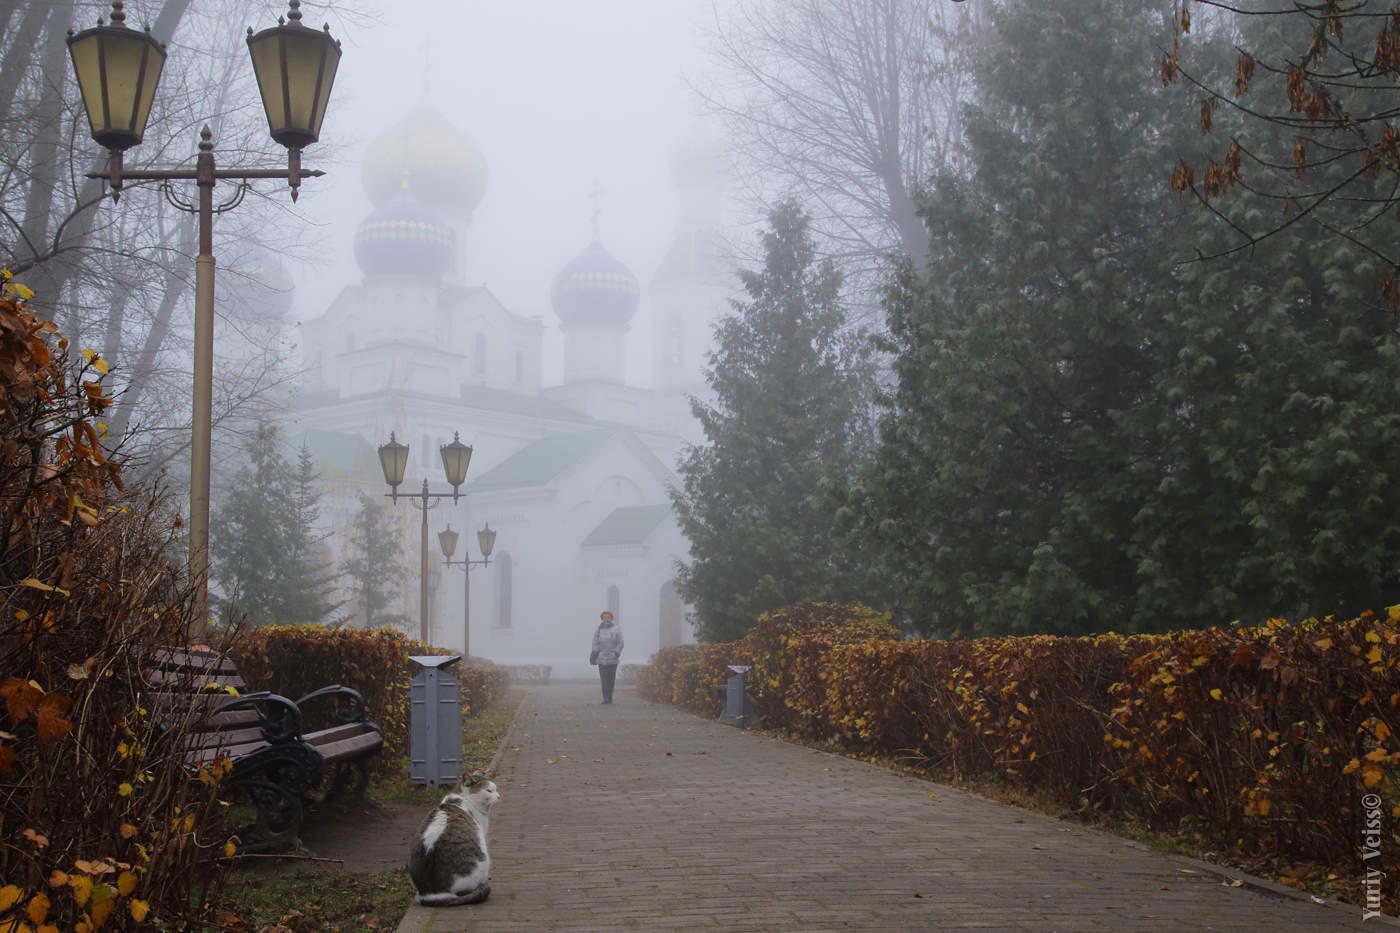 картинка тумана в городе наш